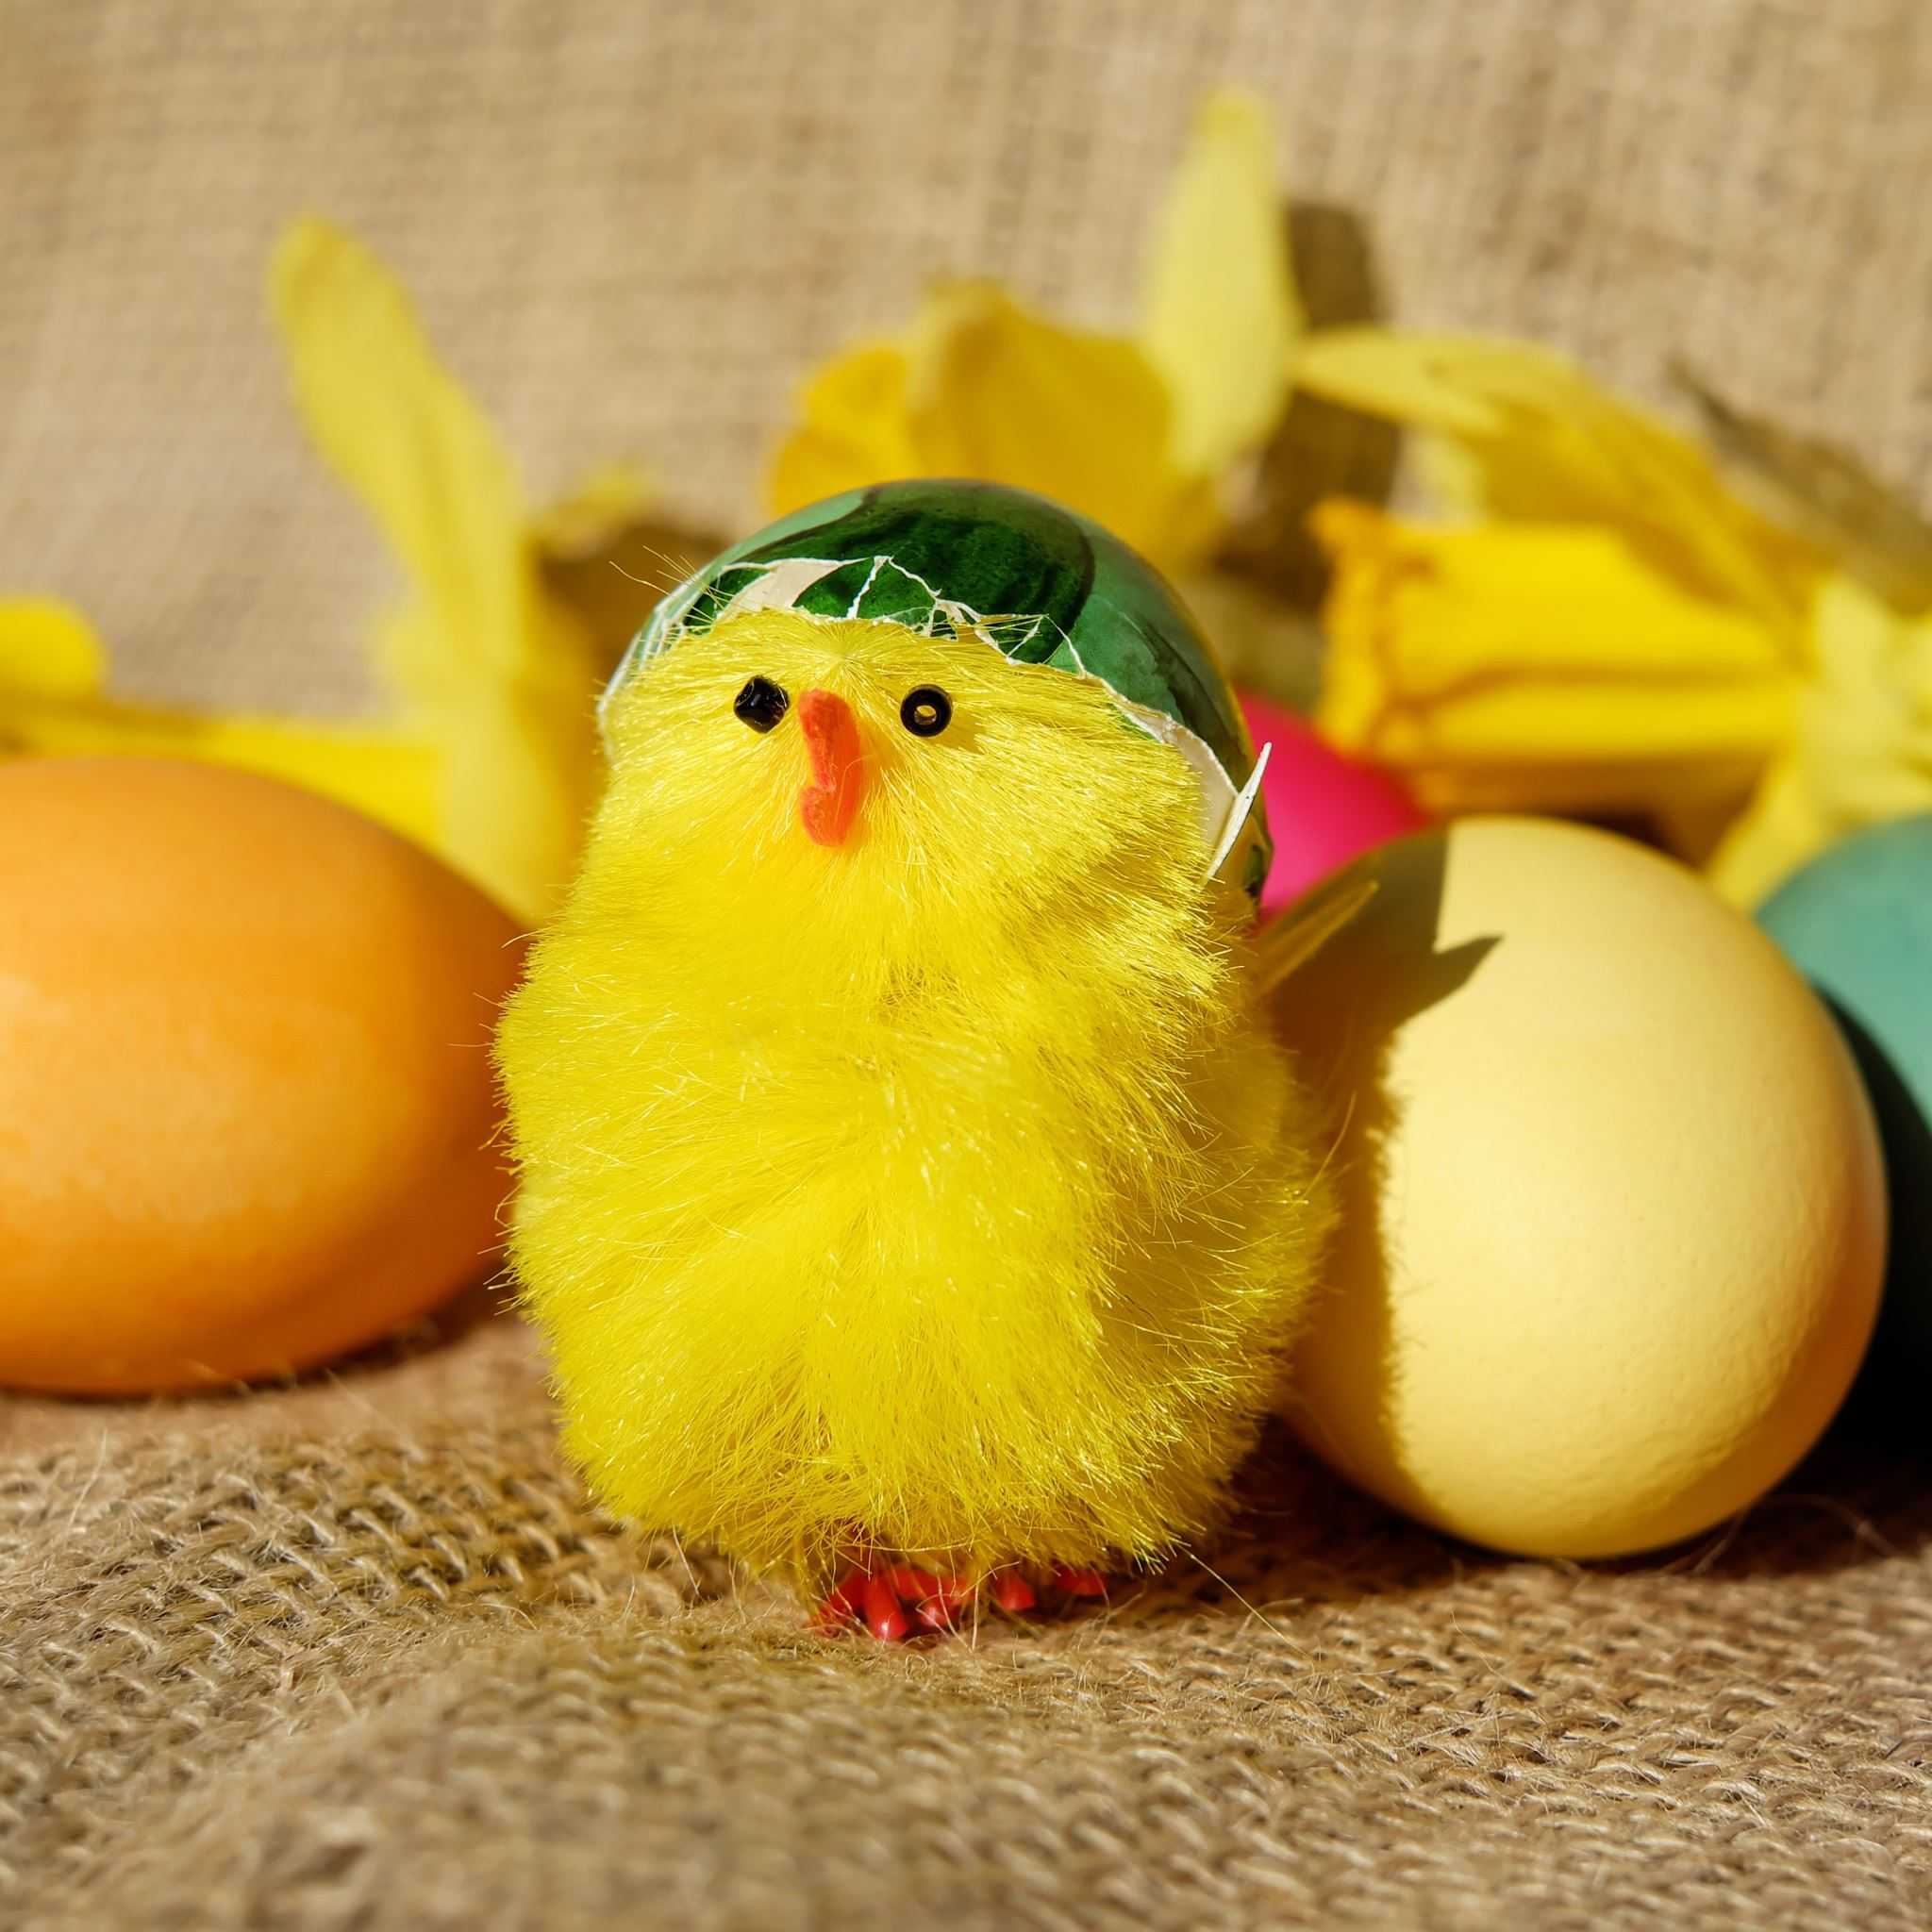 Chick Eggs Easter iPad Air wallpaper